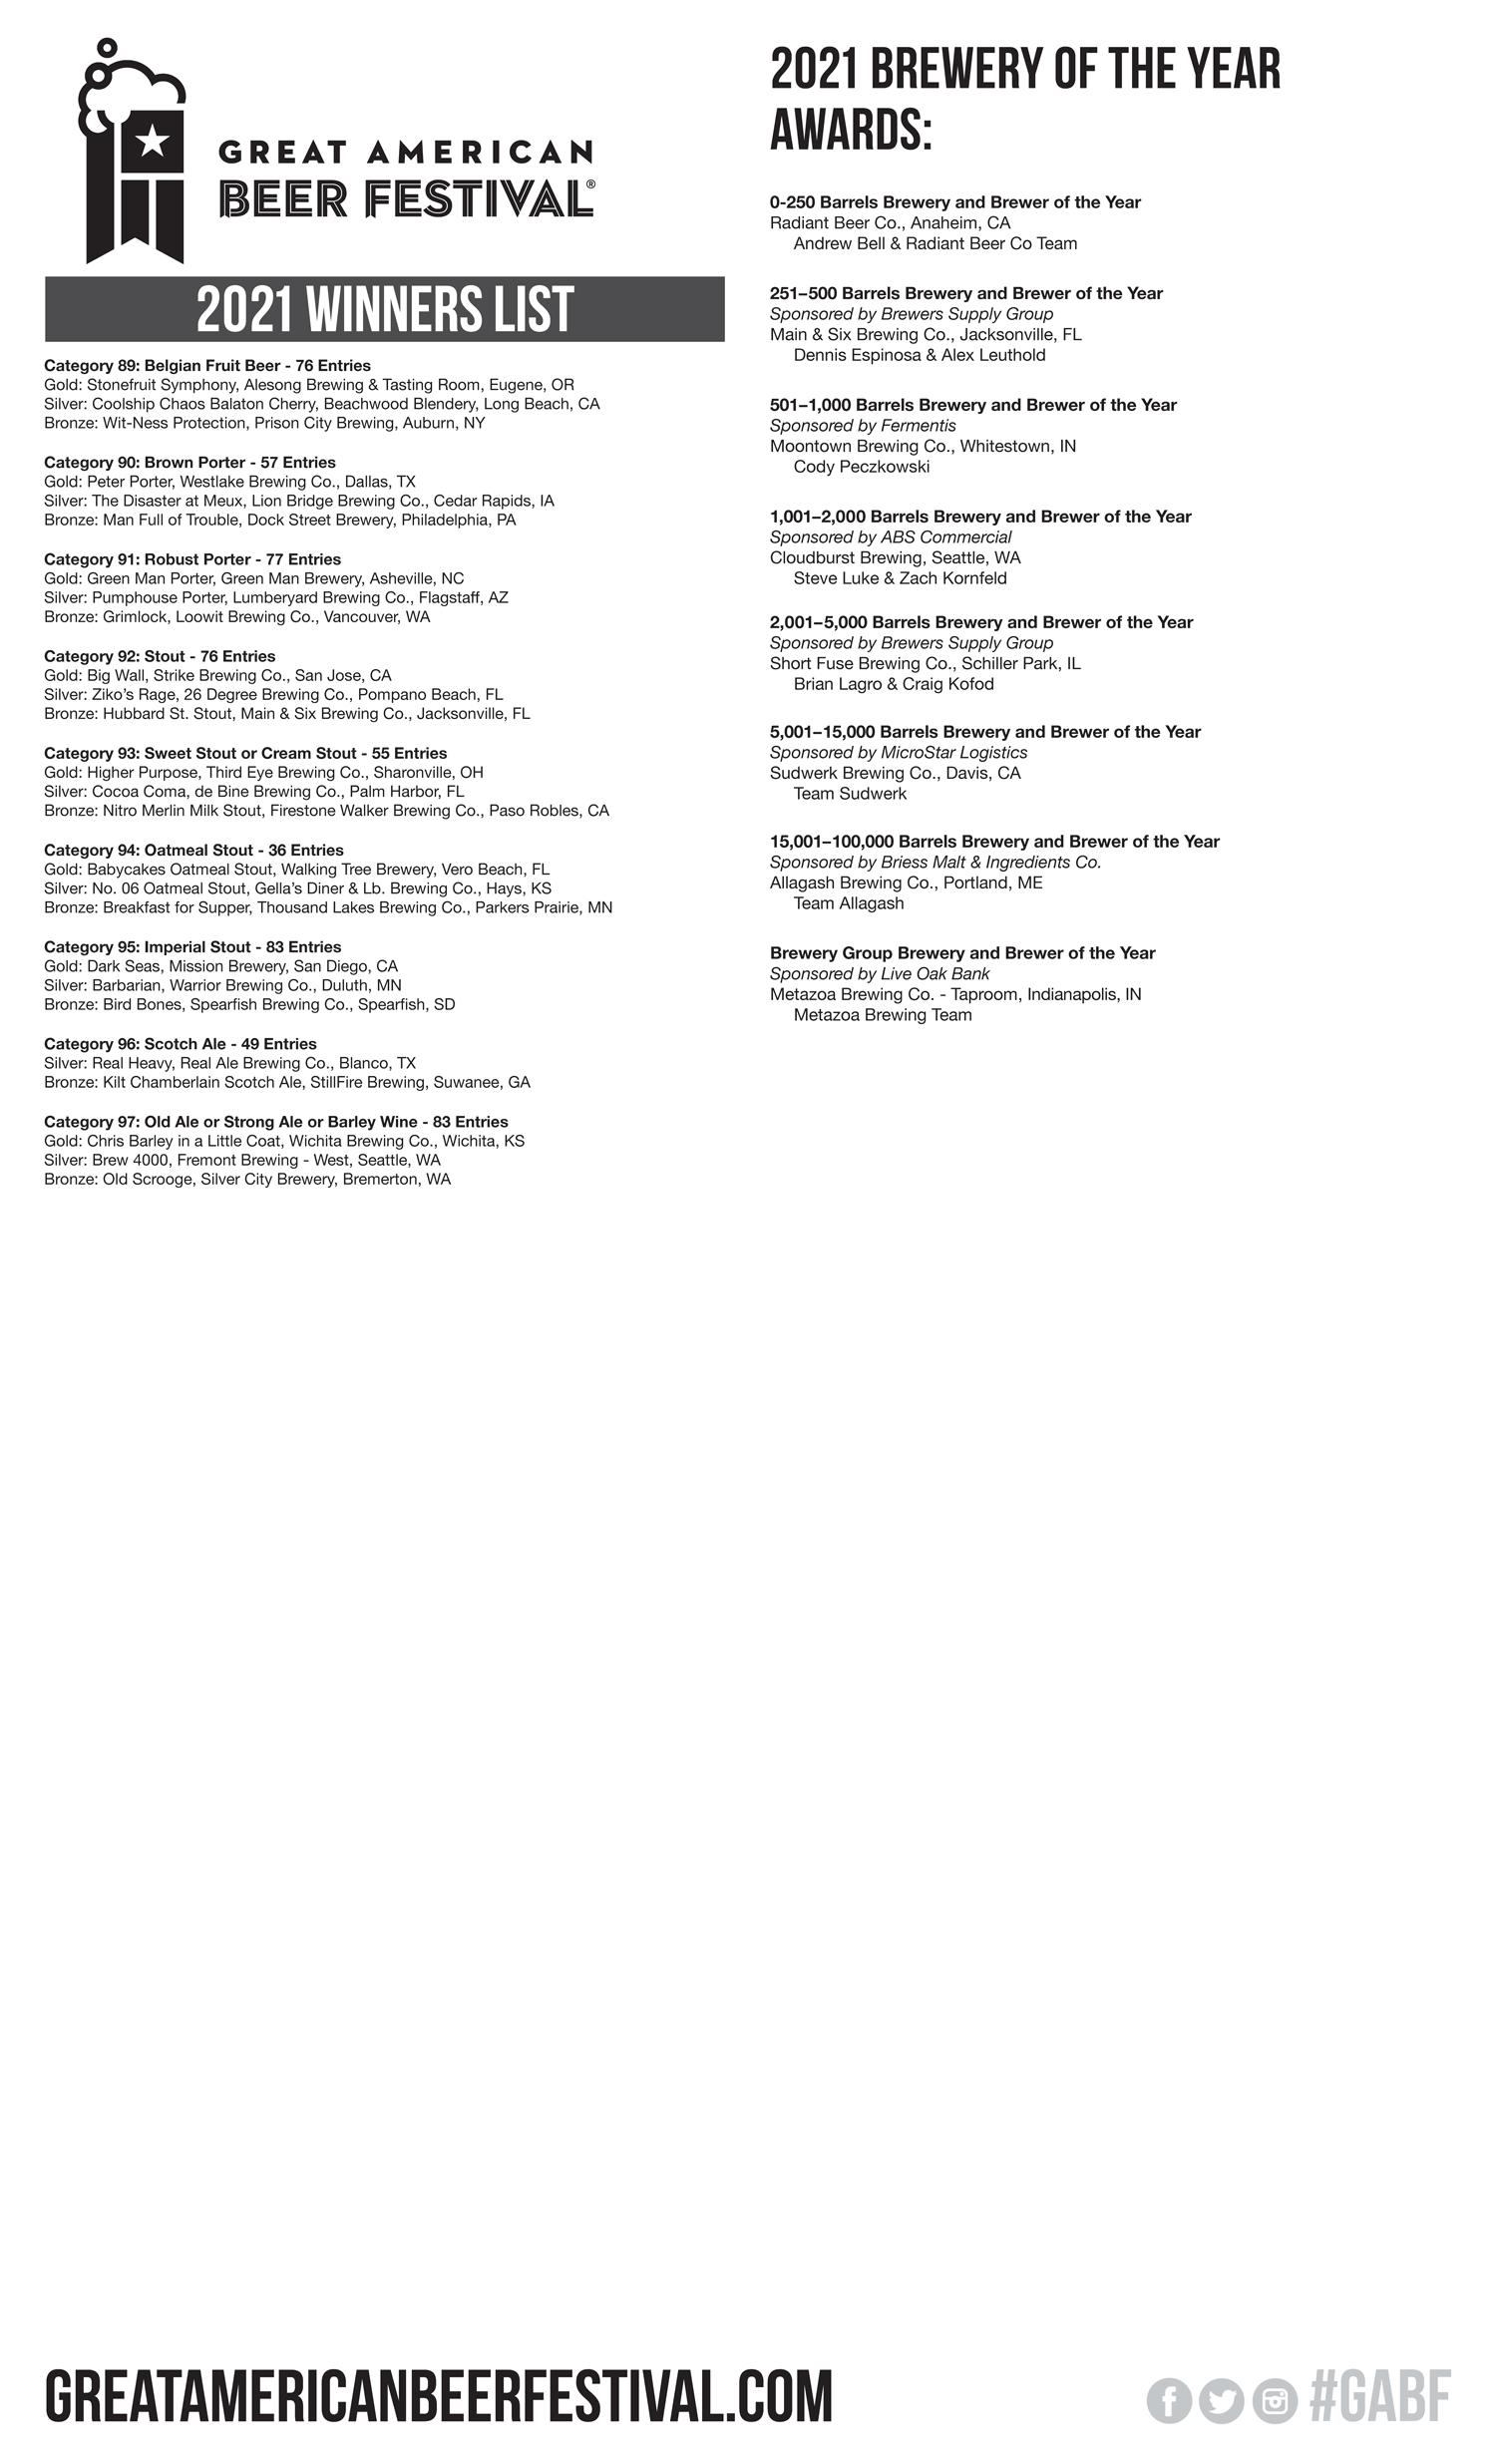 GABF 2021 Winners Page 3